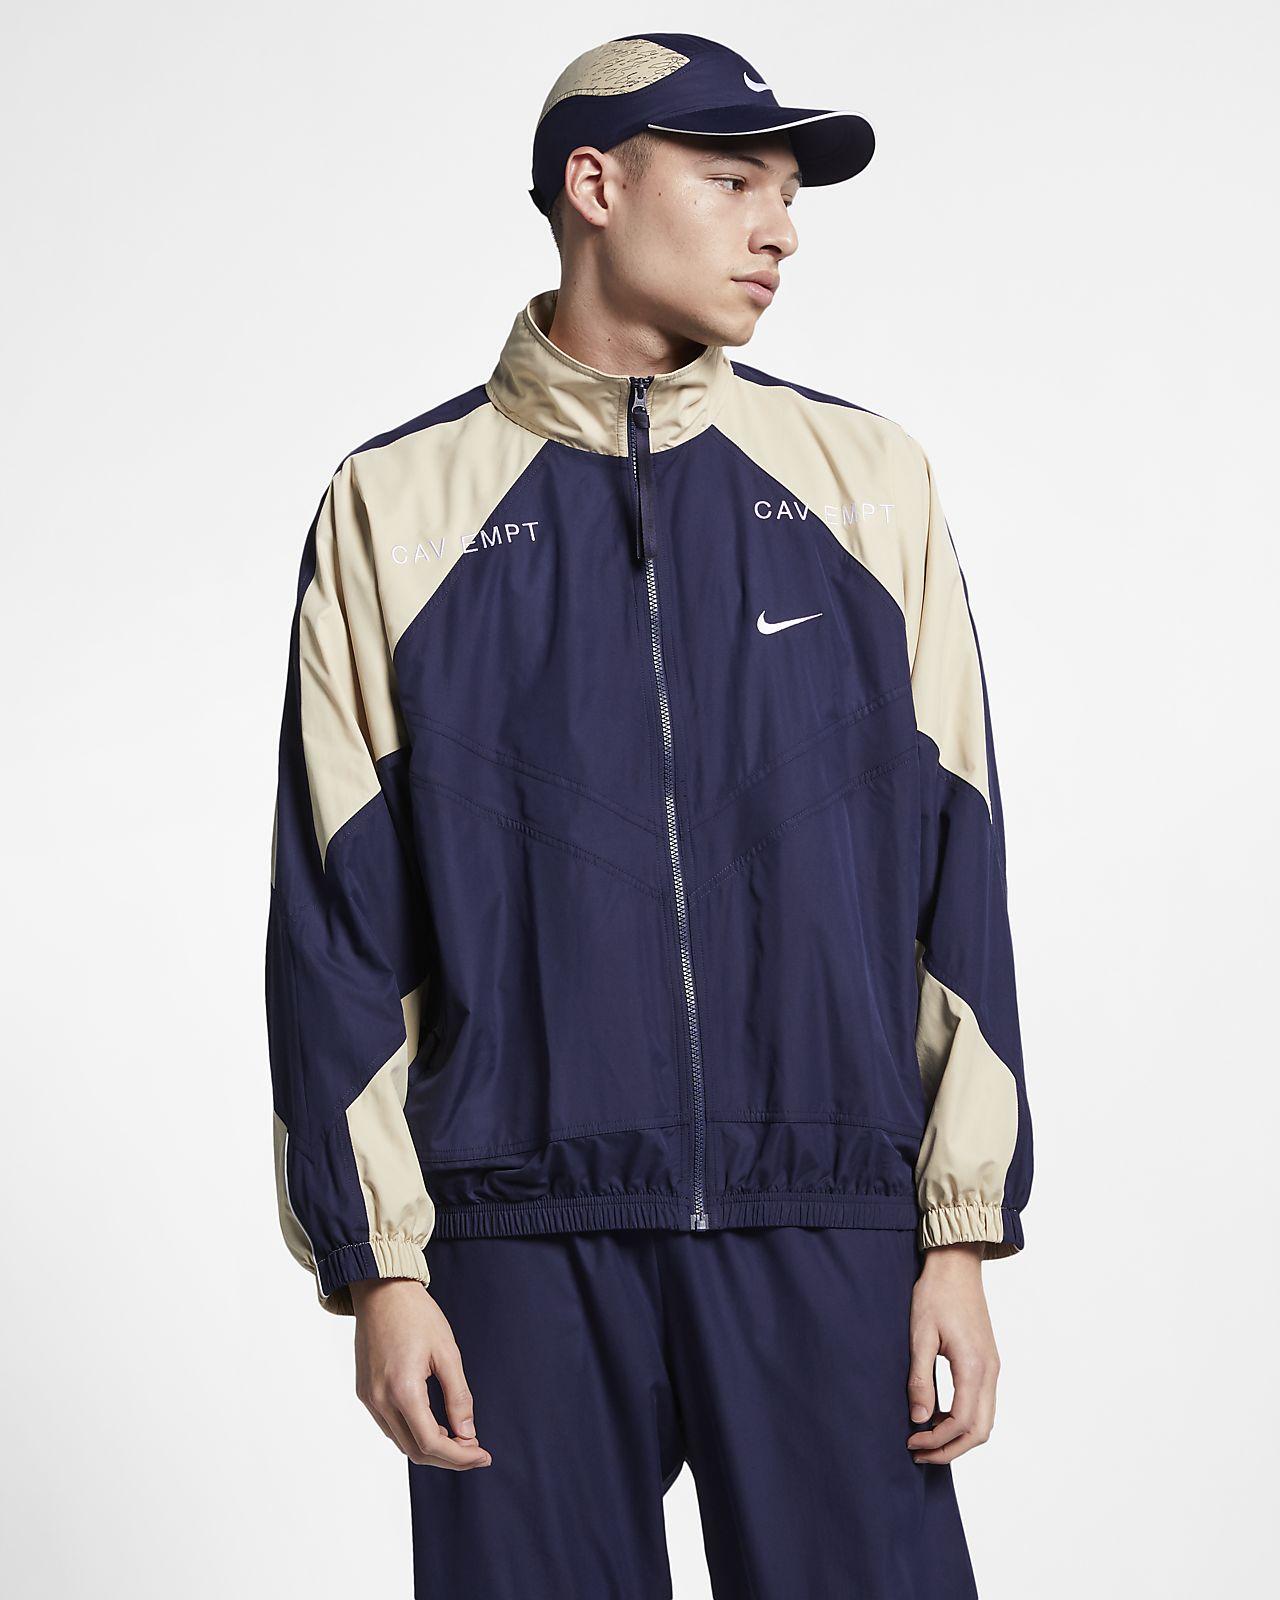 Nike x Cav Empt Men's Track Jacket